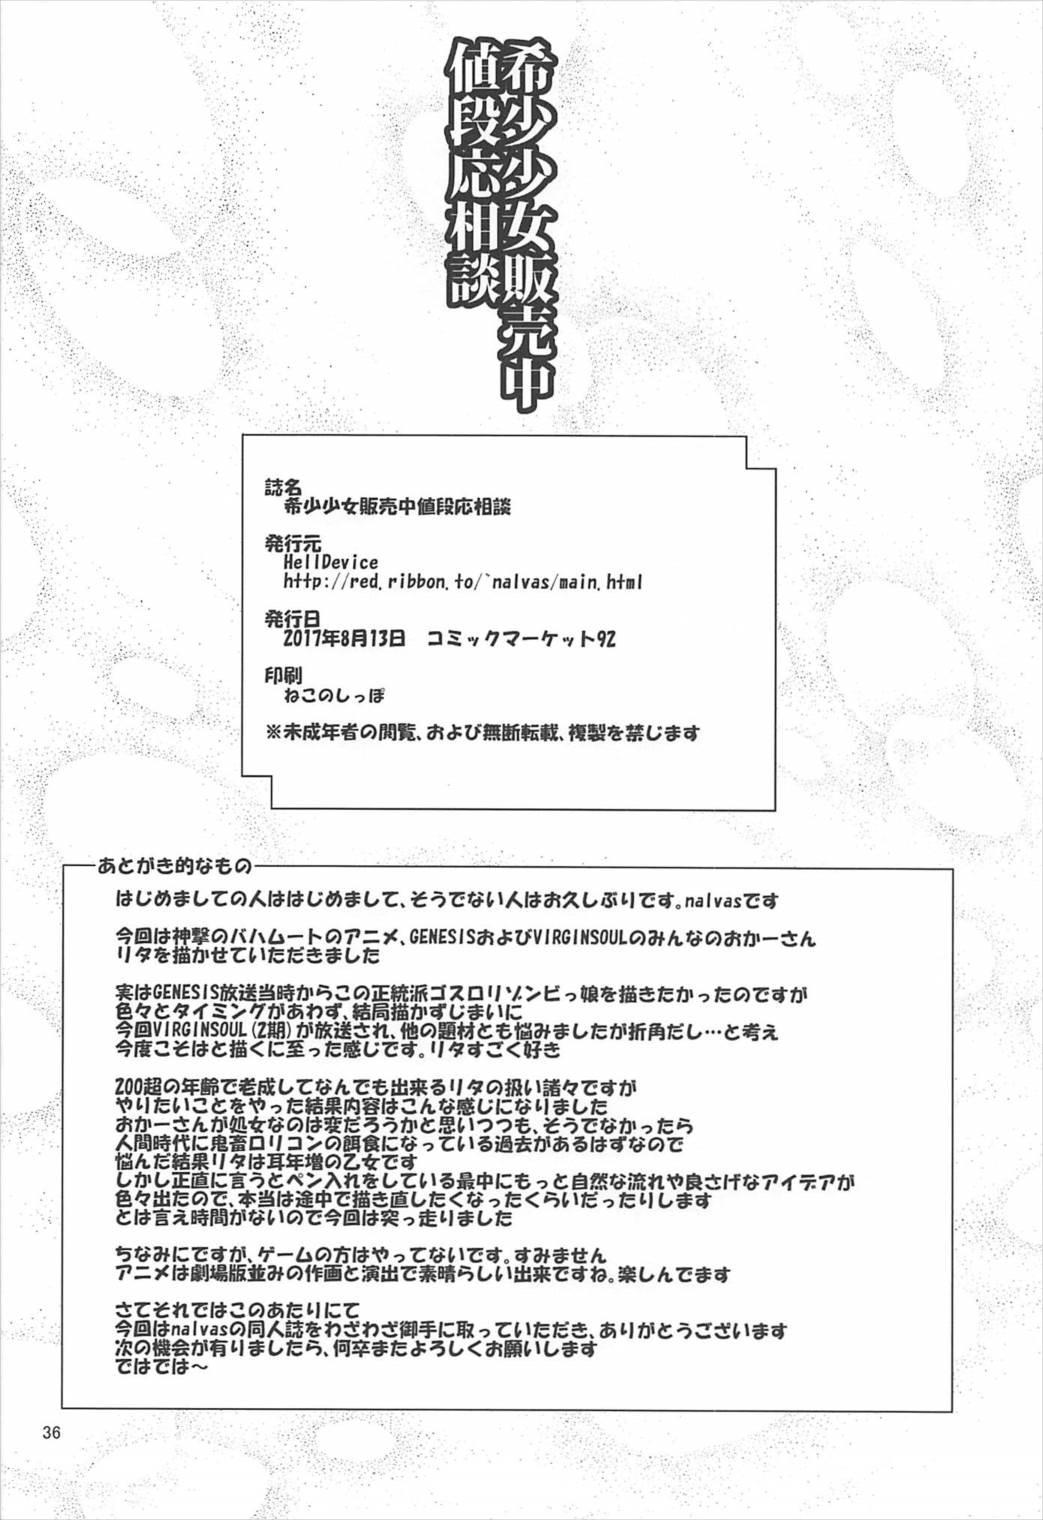 Kishou Shoujo Hanbaichuu Nedan Ou Soudan 34